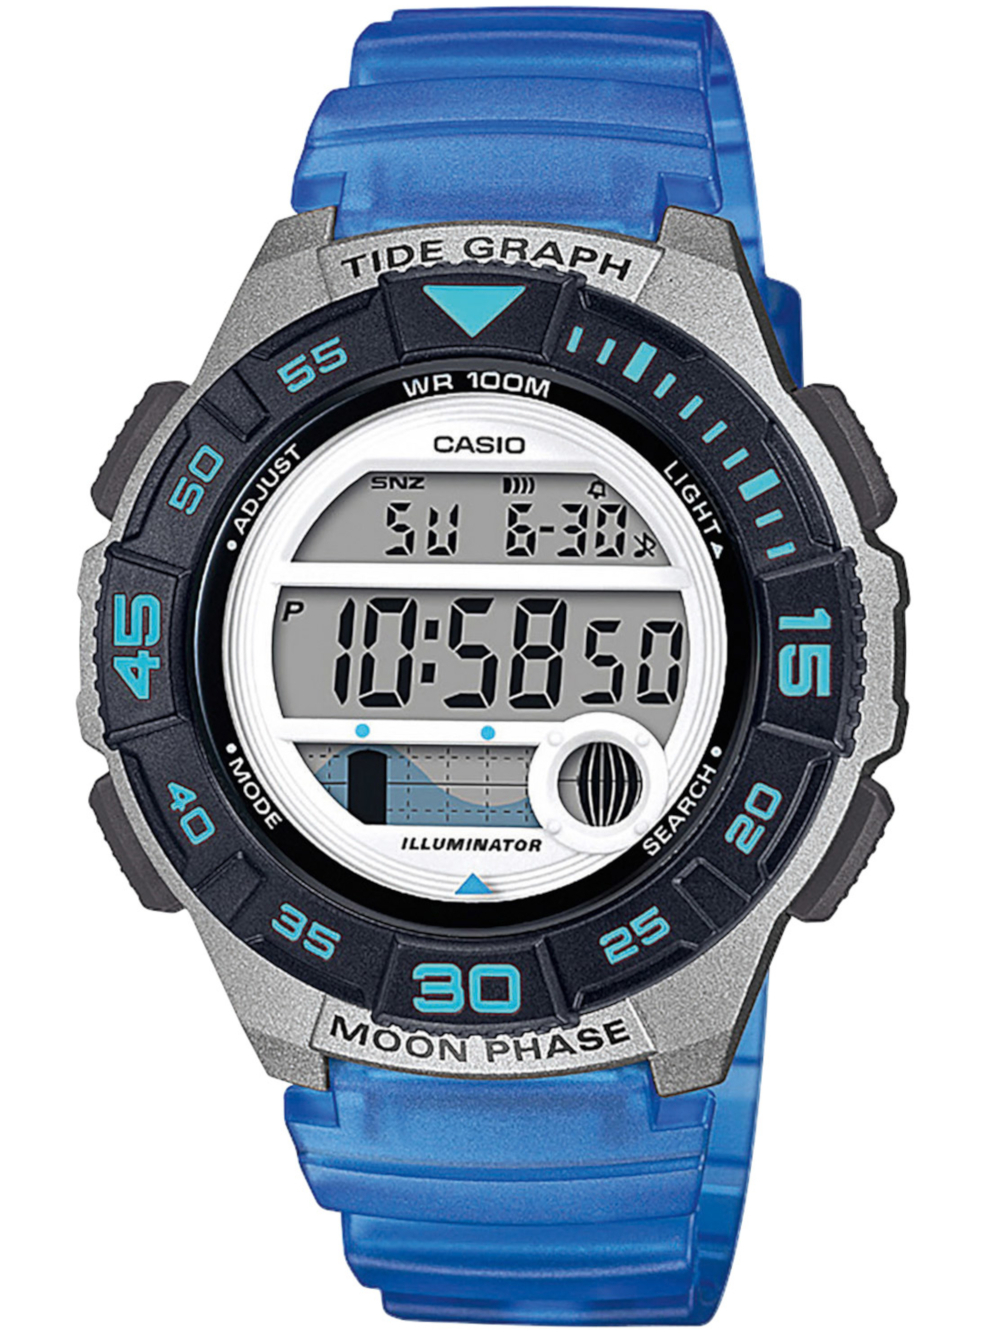 Uhren - Casio LWS 1100H 2AVEF Collection Damen 38mm 10ATM  - Onlineshop Timeshop24